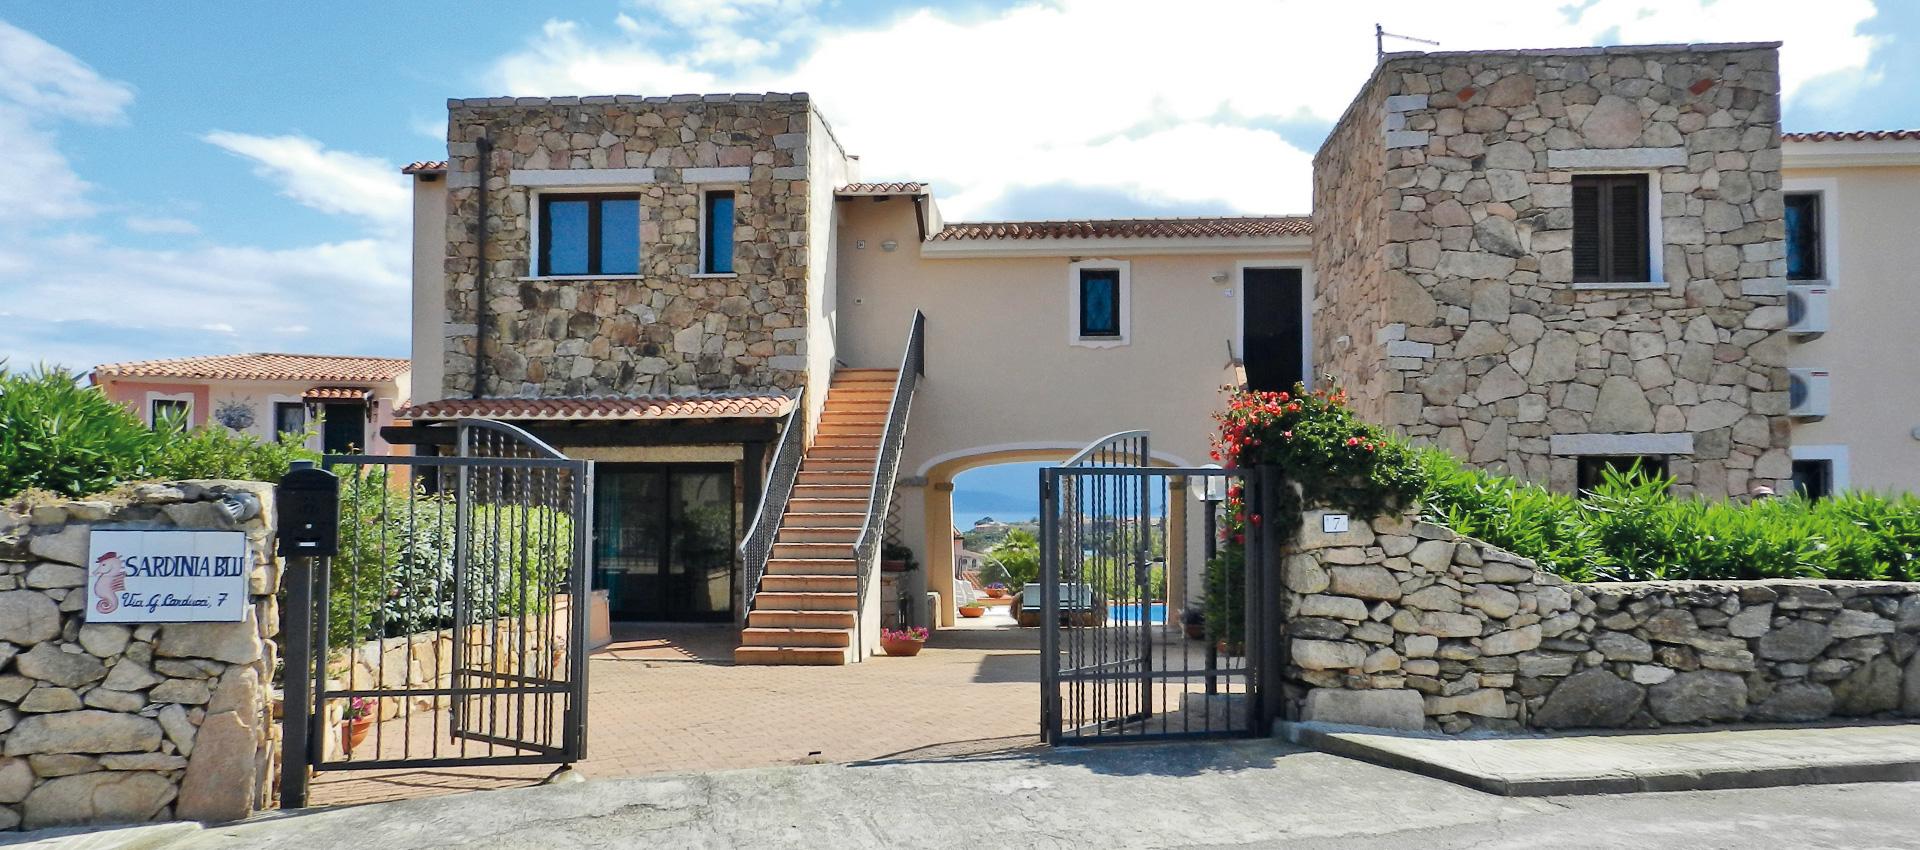 residence in sardegna residence in sardegna